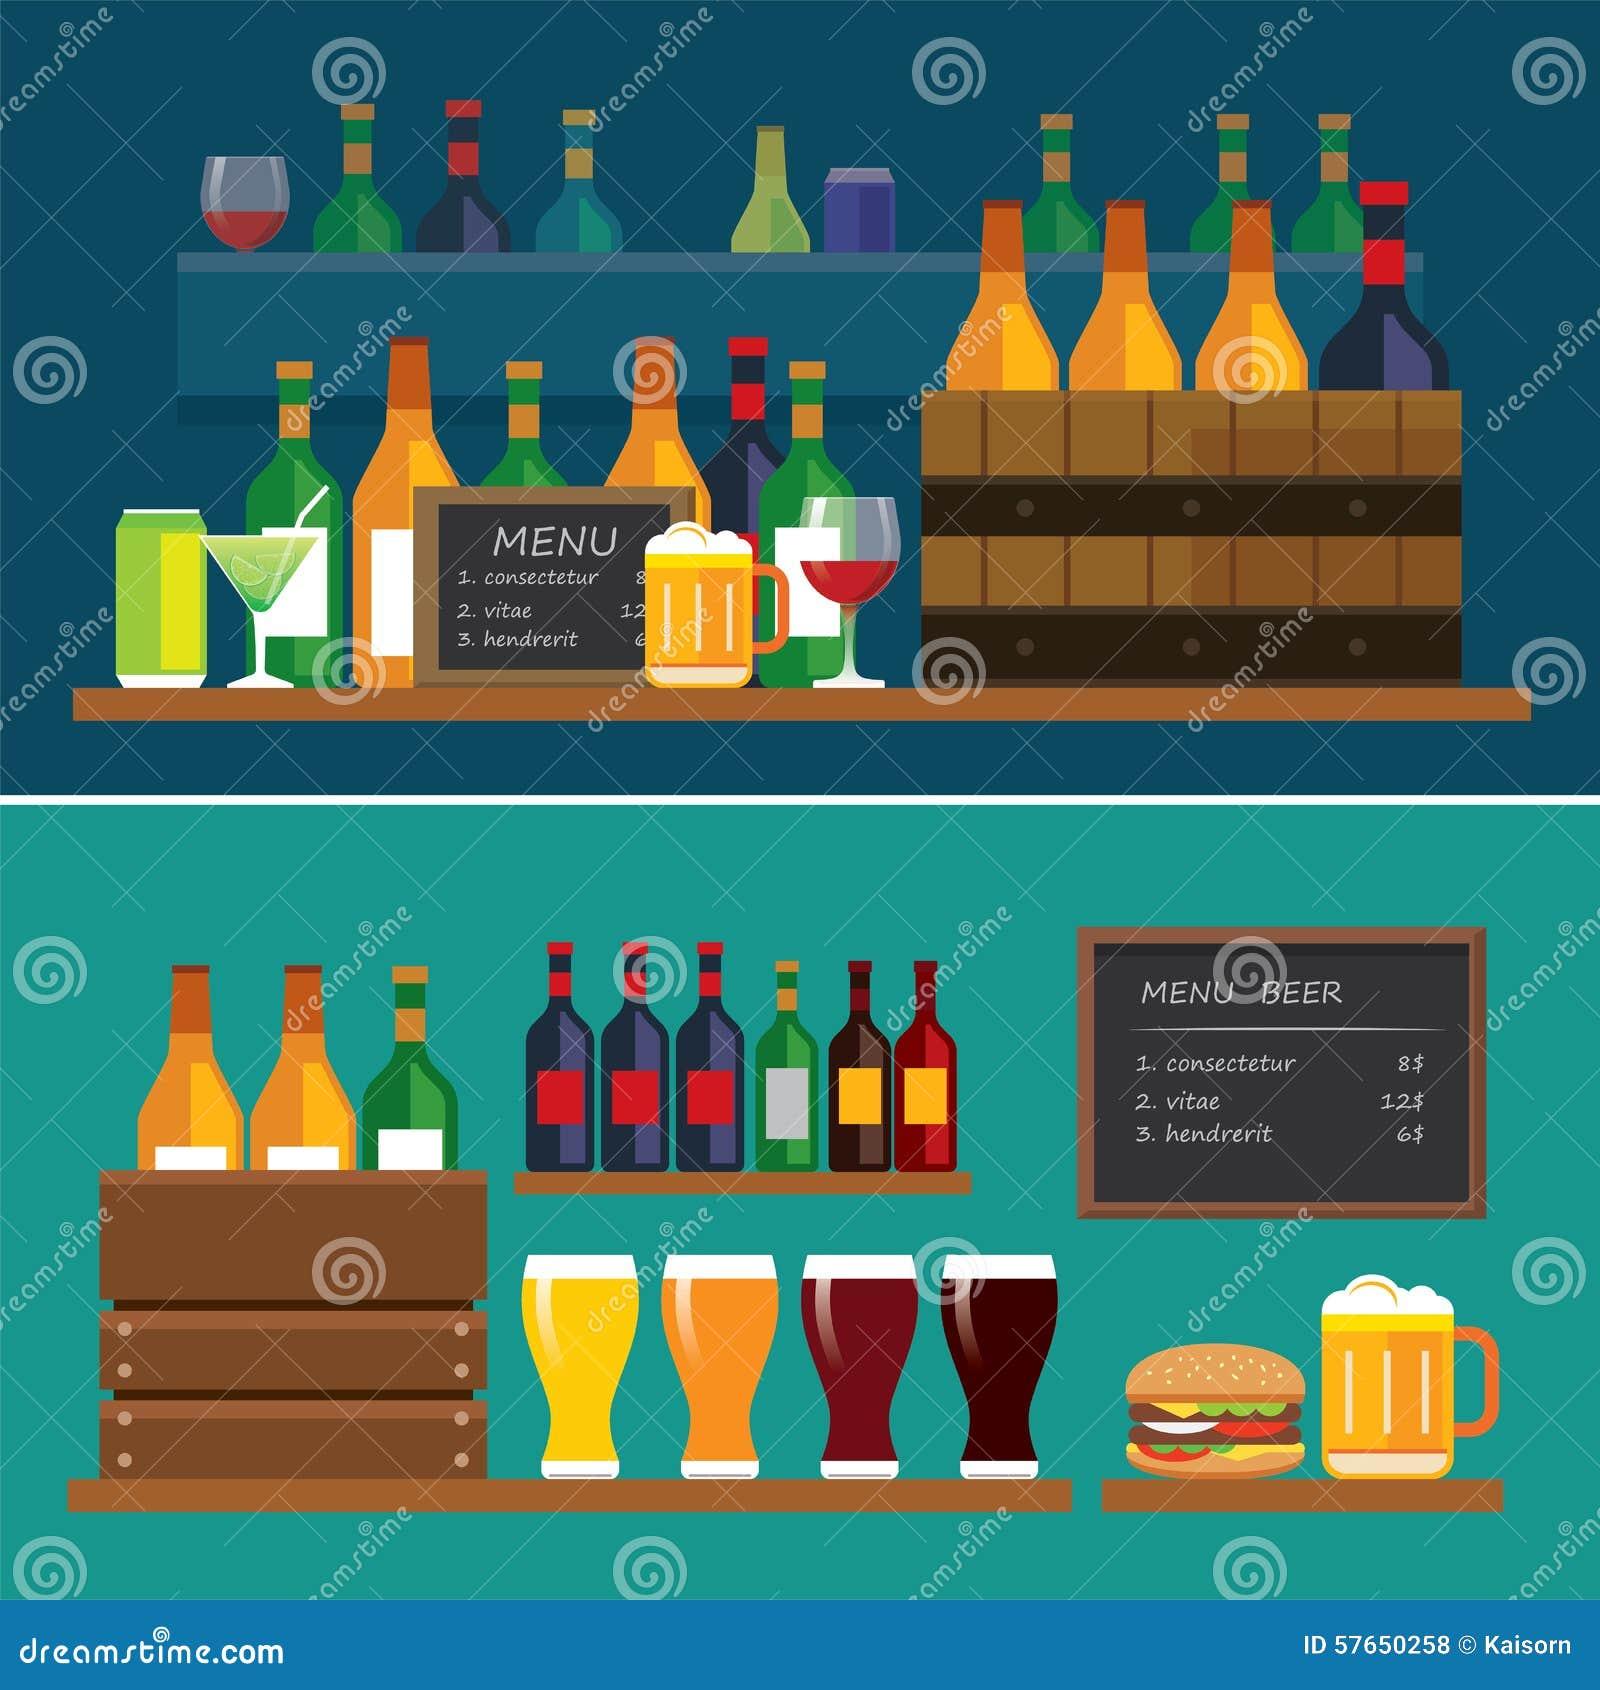 Drank en bier vlakke ontwerpbanner